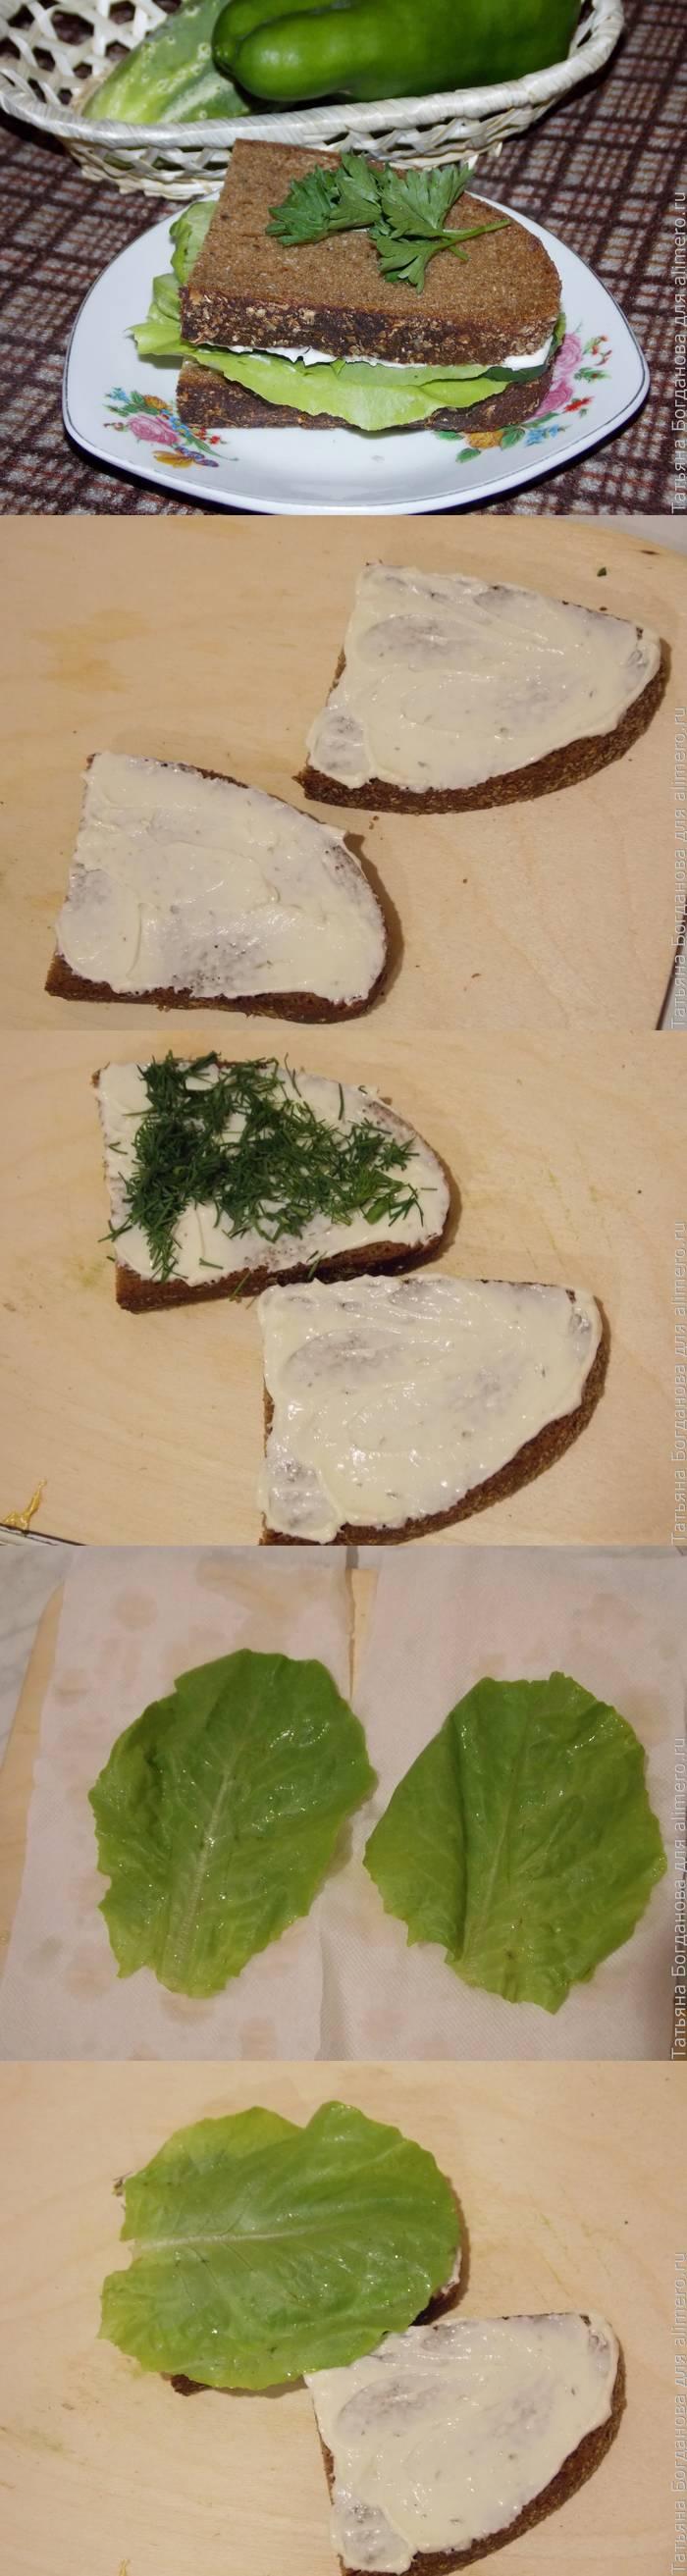 Бутерброд со свежим огурцом